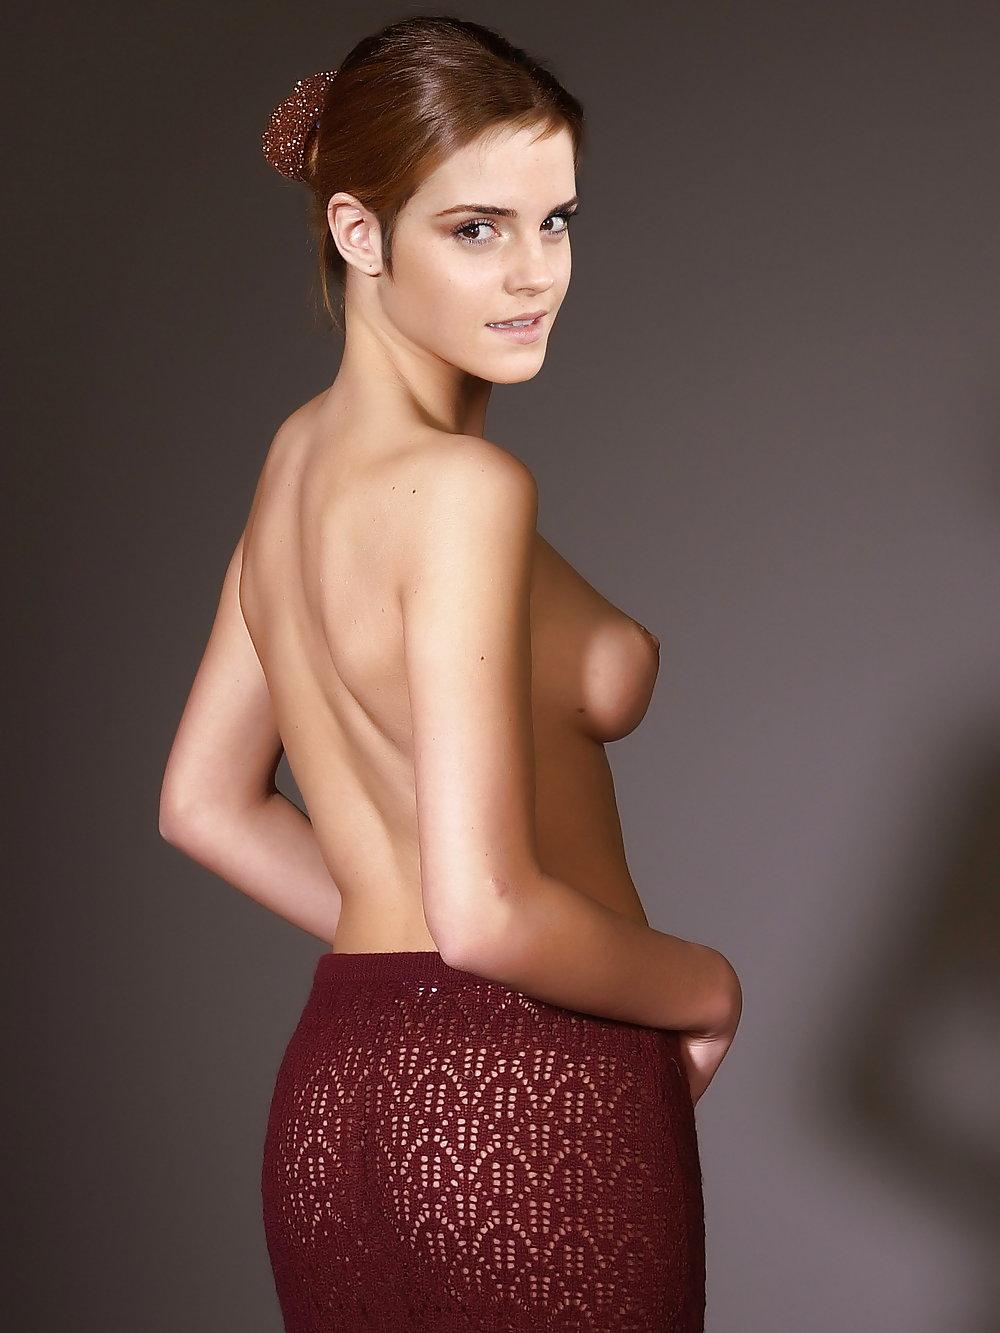 women-bikinis-emma-watson-free-sexy-bikini-pics-sagal-uncut-rape